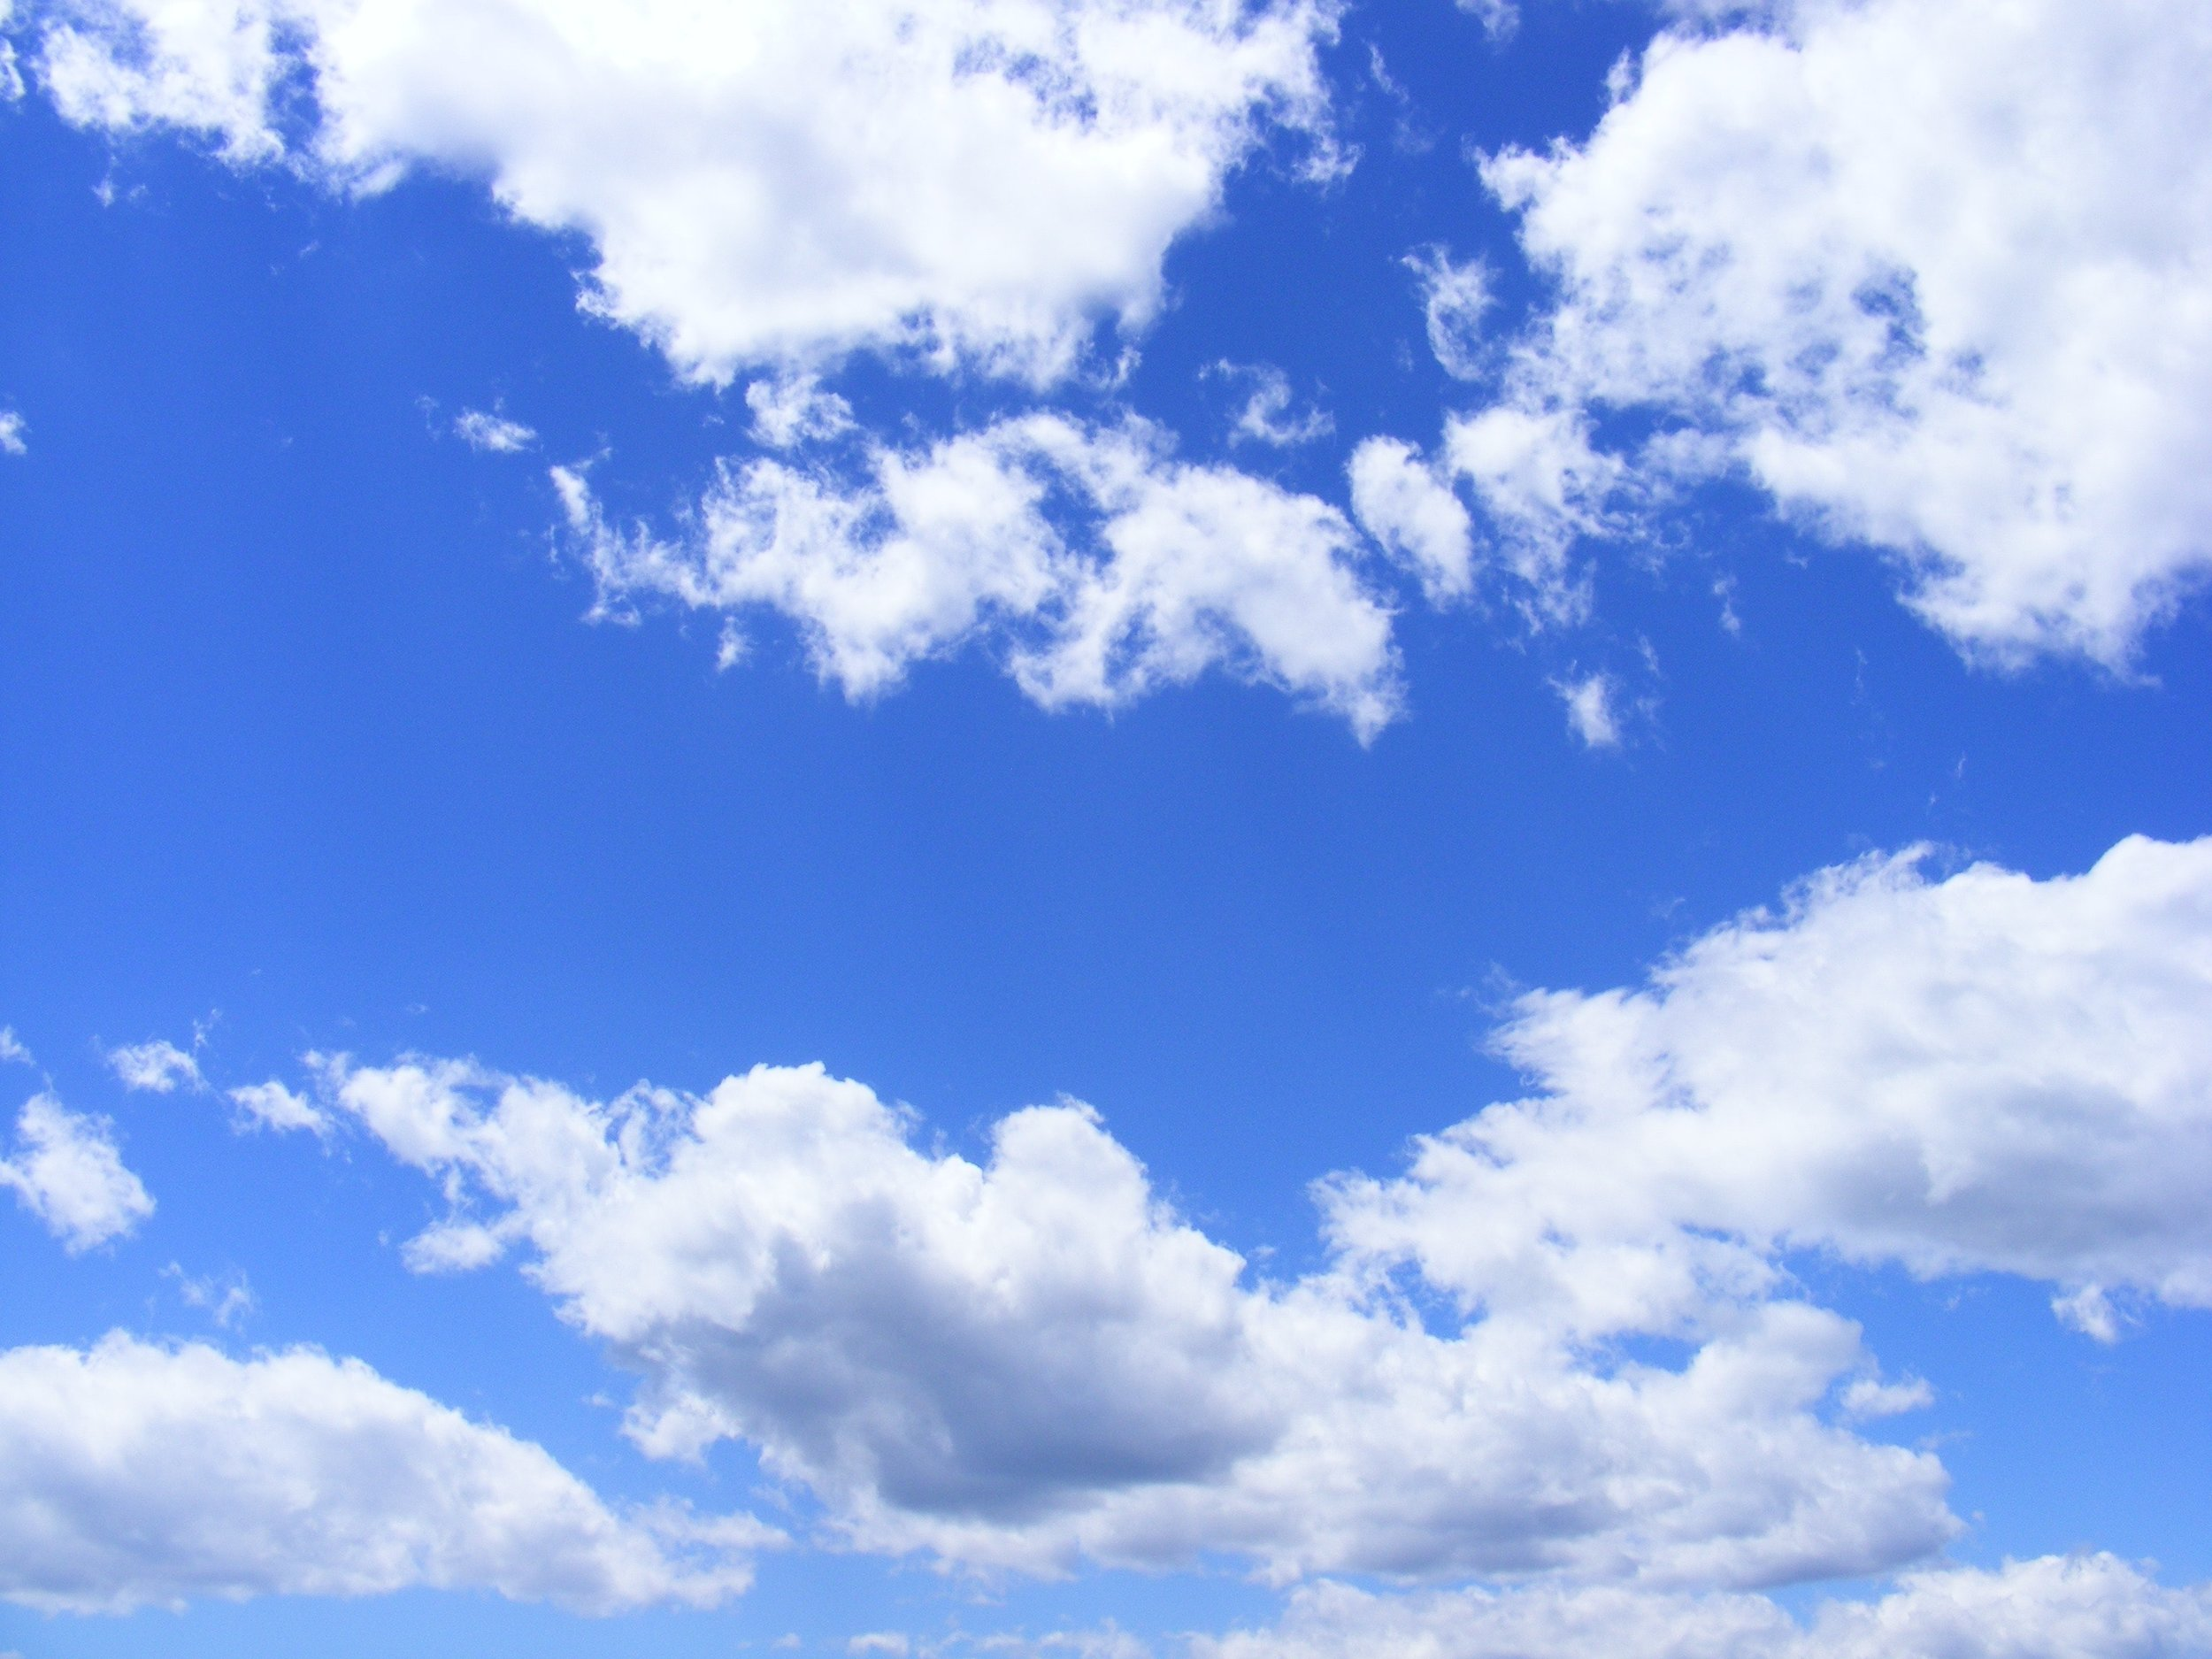 blue-clouds-day-53594 (1).jpg